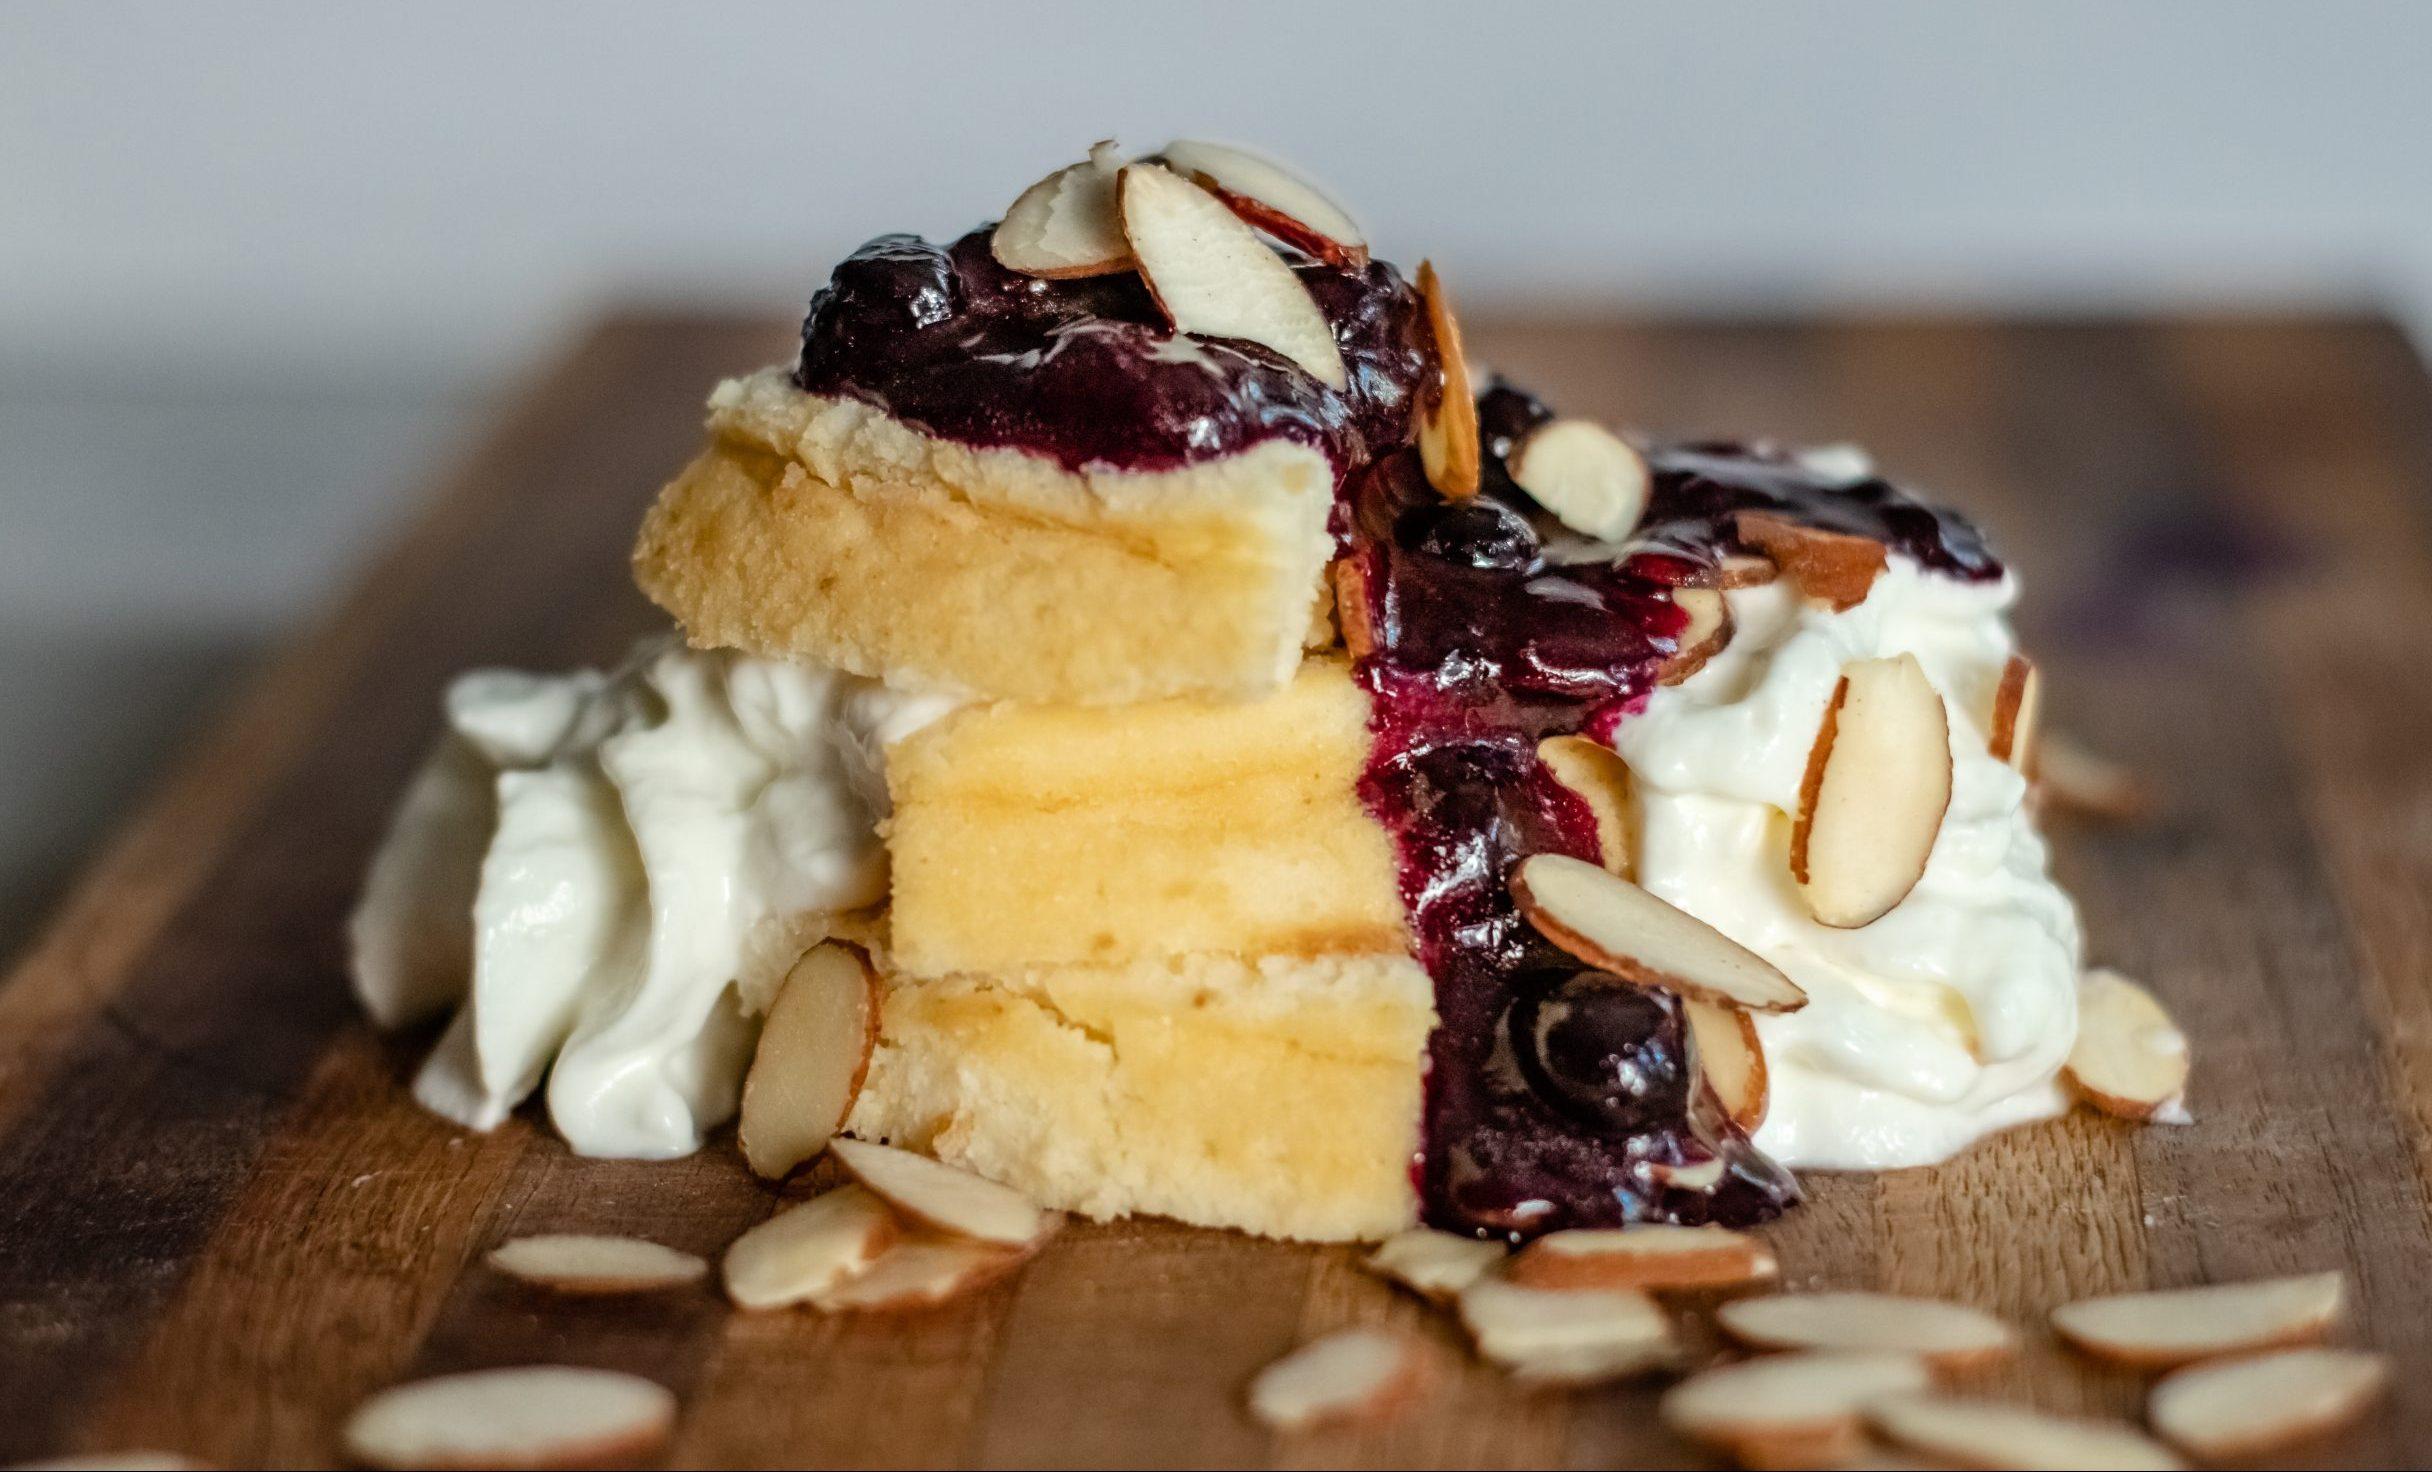 Crustless Cheese Cakes